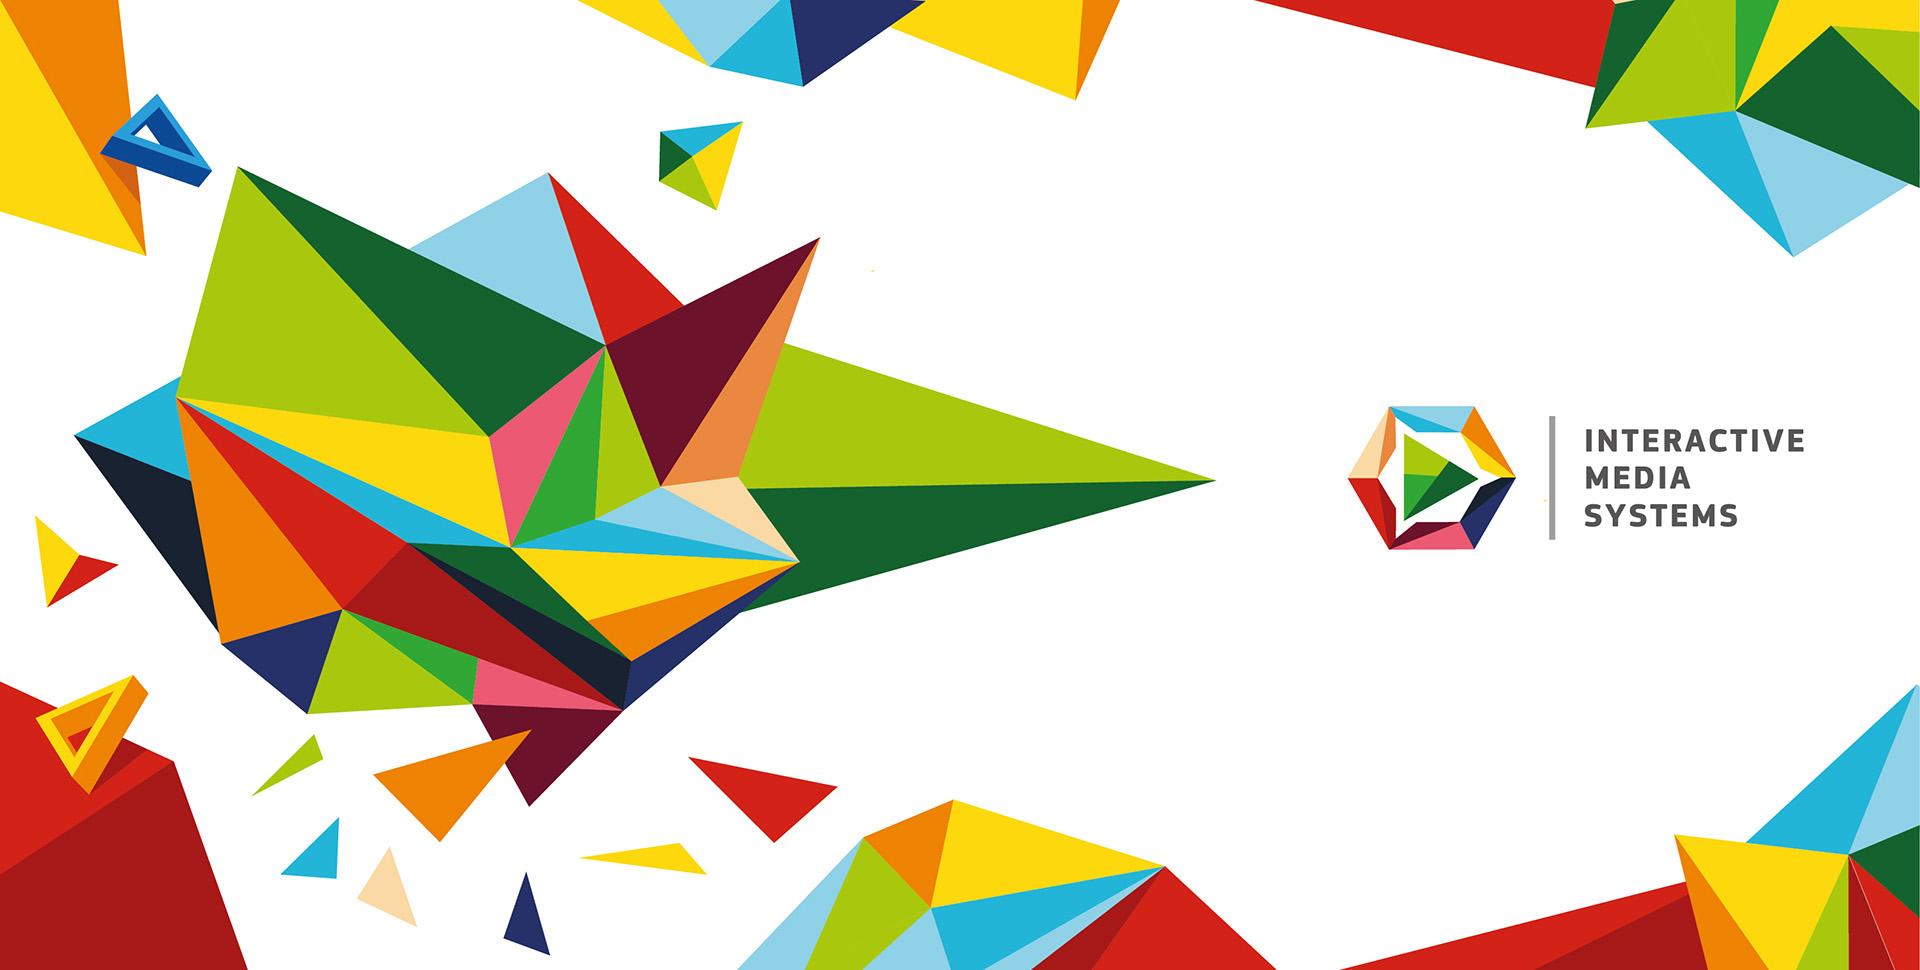 Разработка логотипа в геометрическом стиле